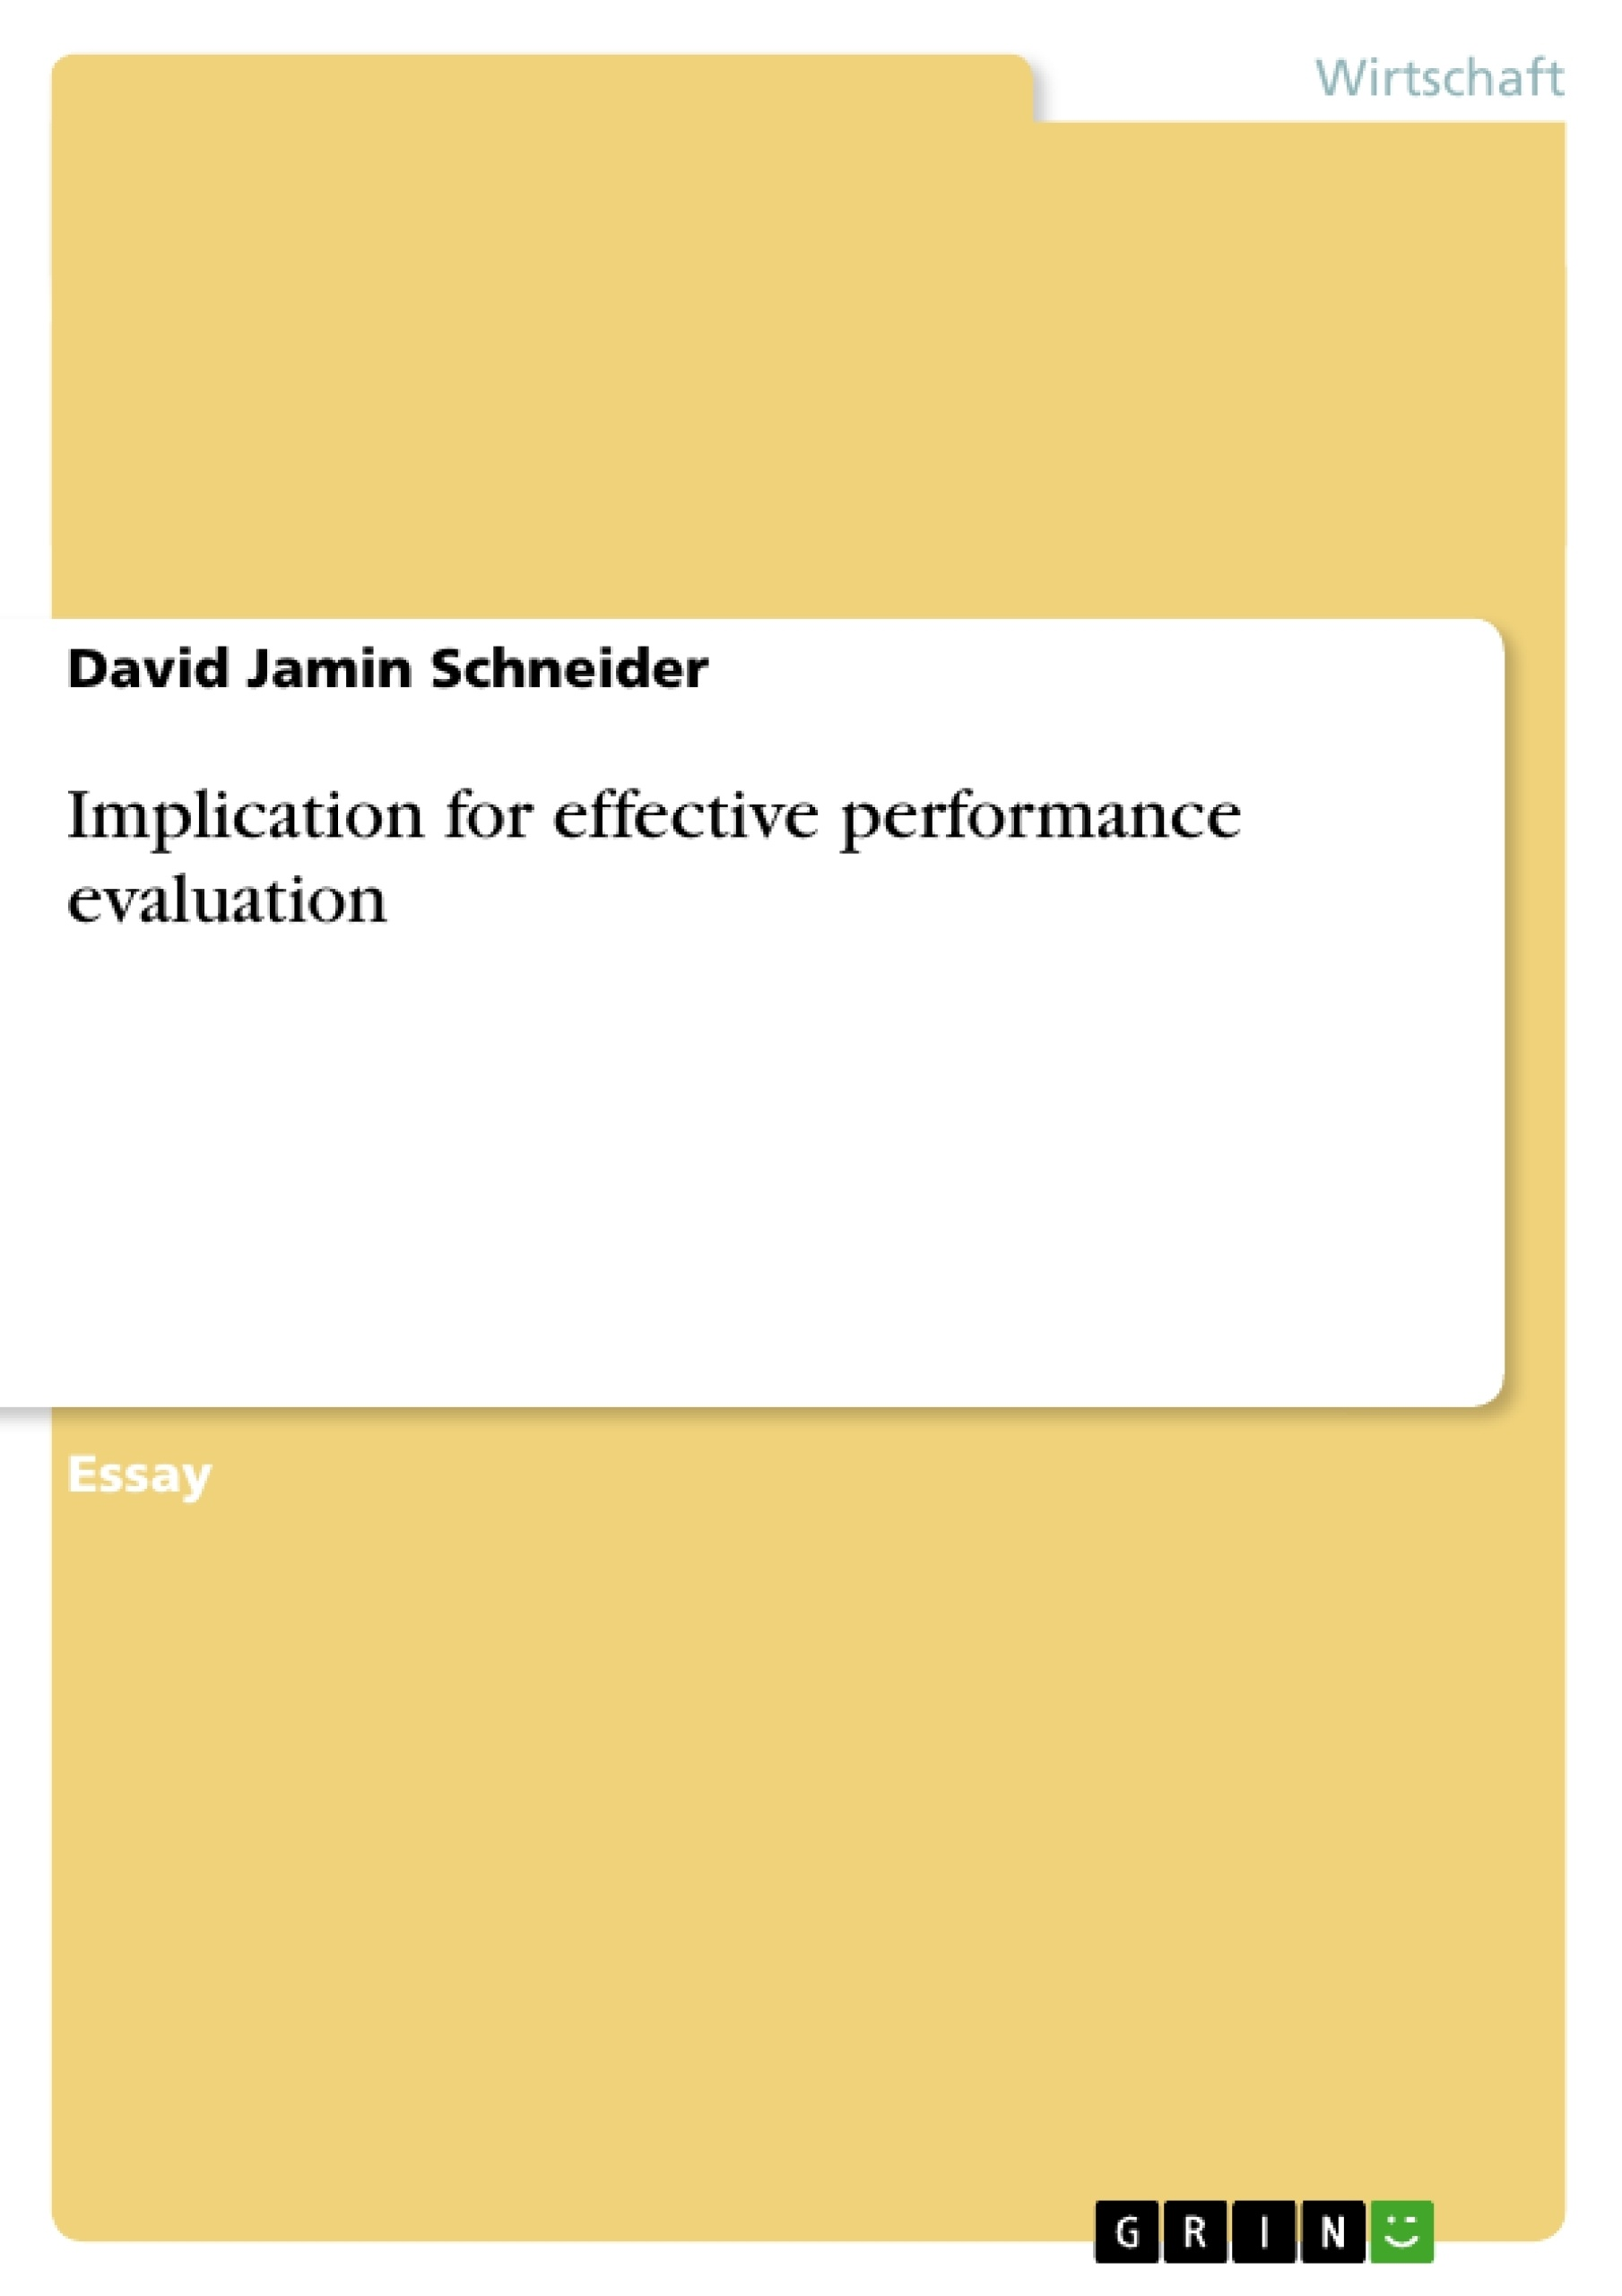 Titel: Implication for effective performance evaluation